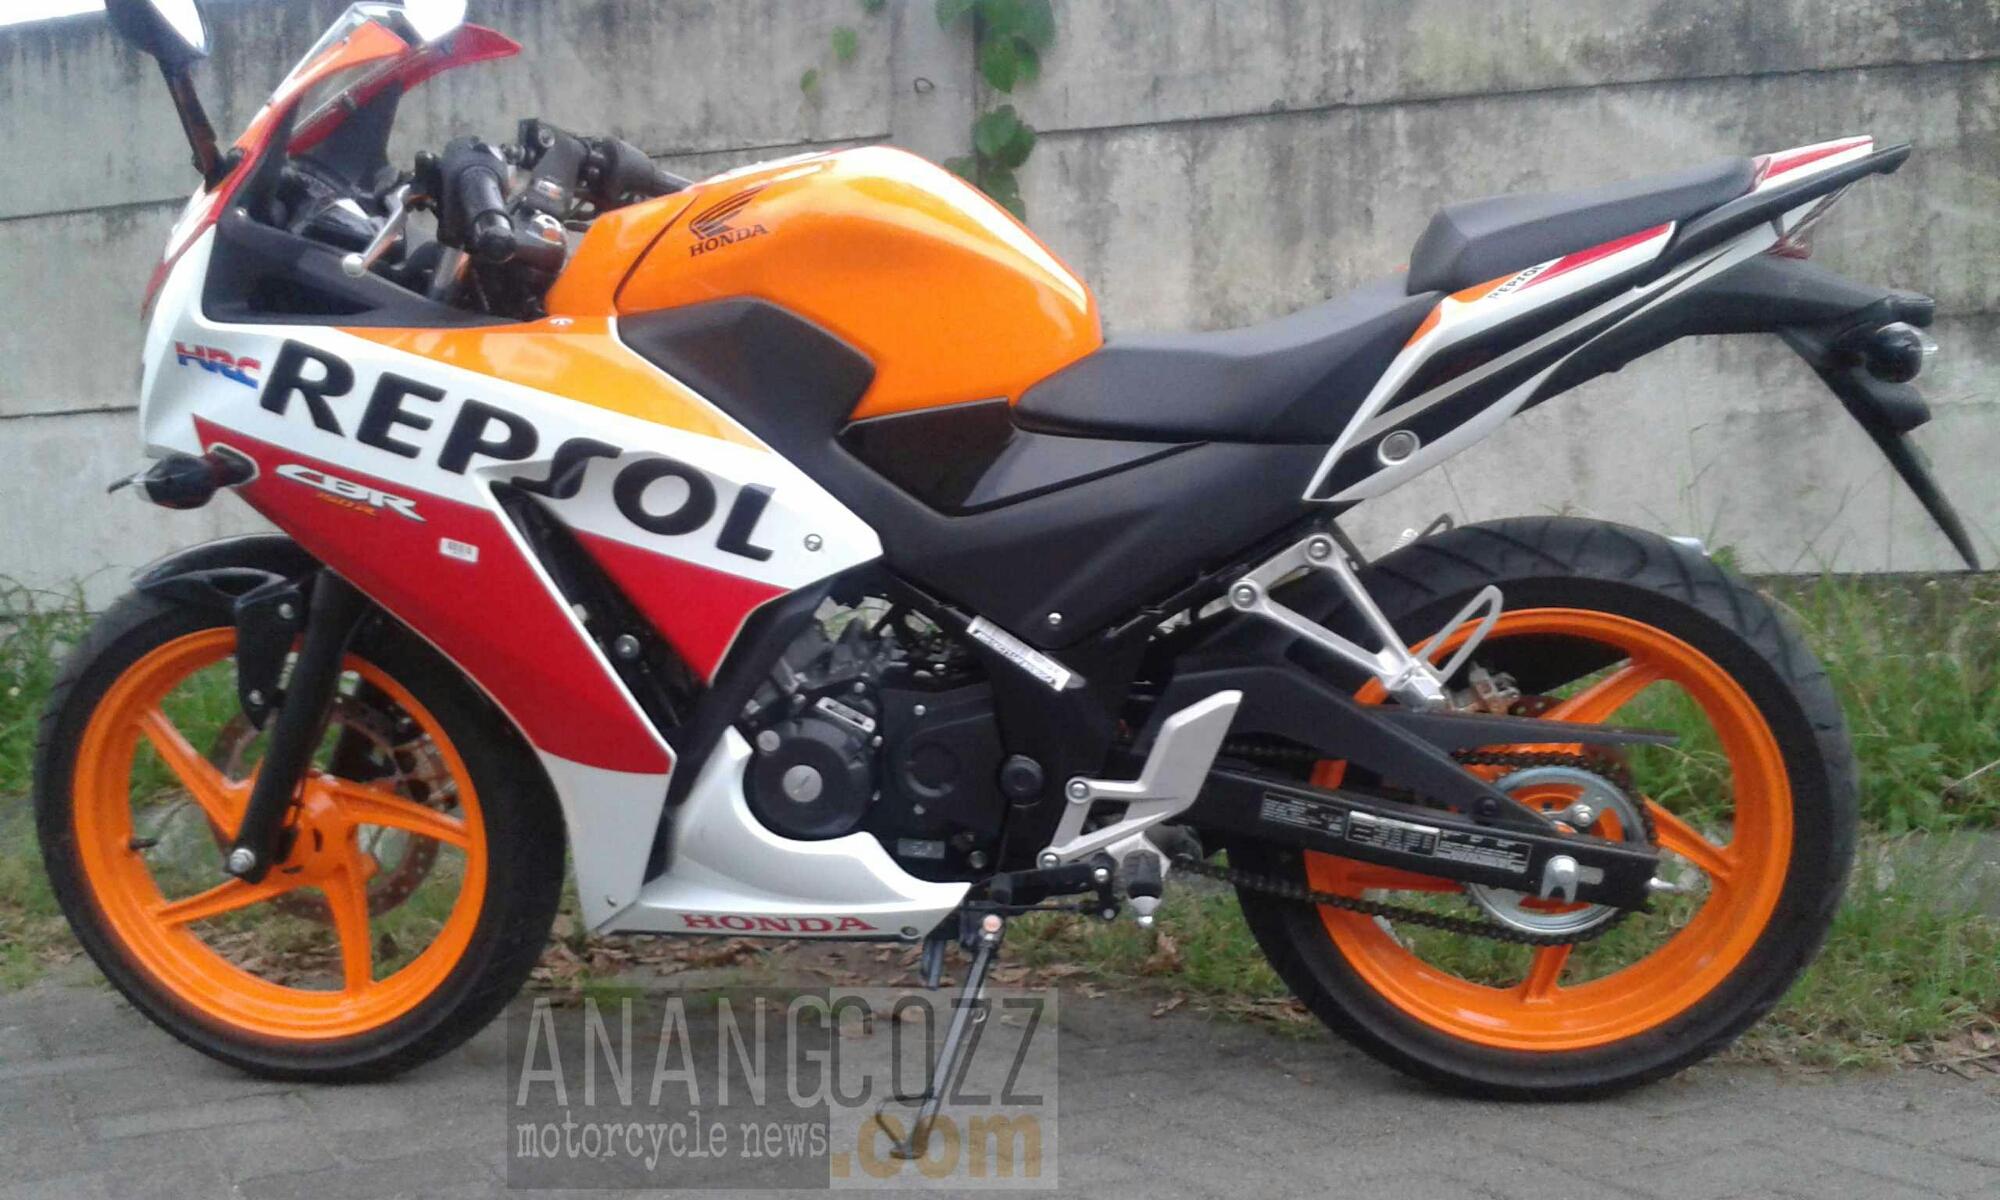 Galeri All New Honda CBR150R Desain Kompak Sporty Abiss